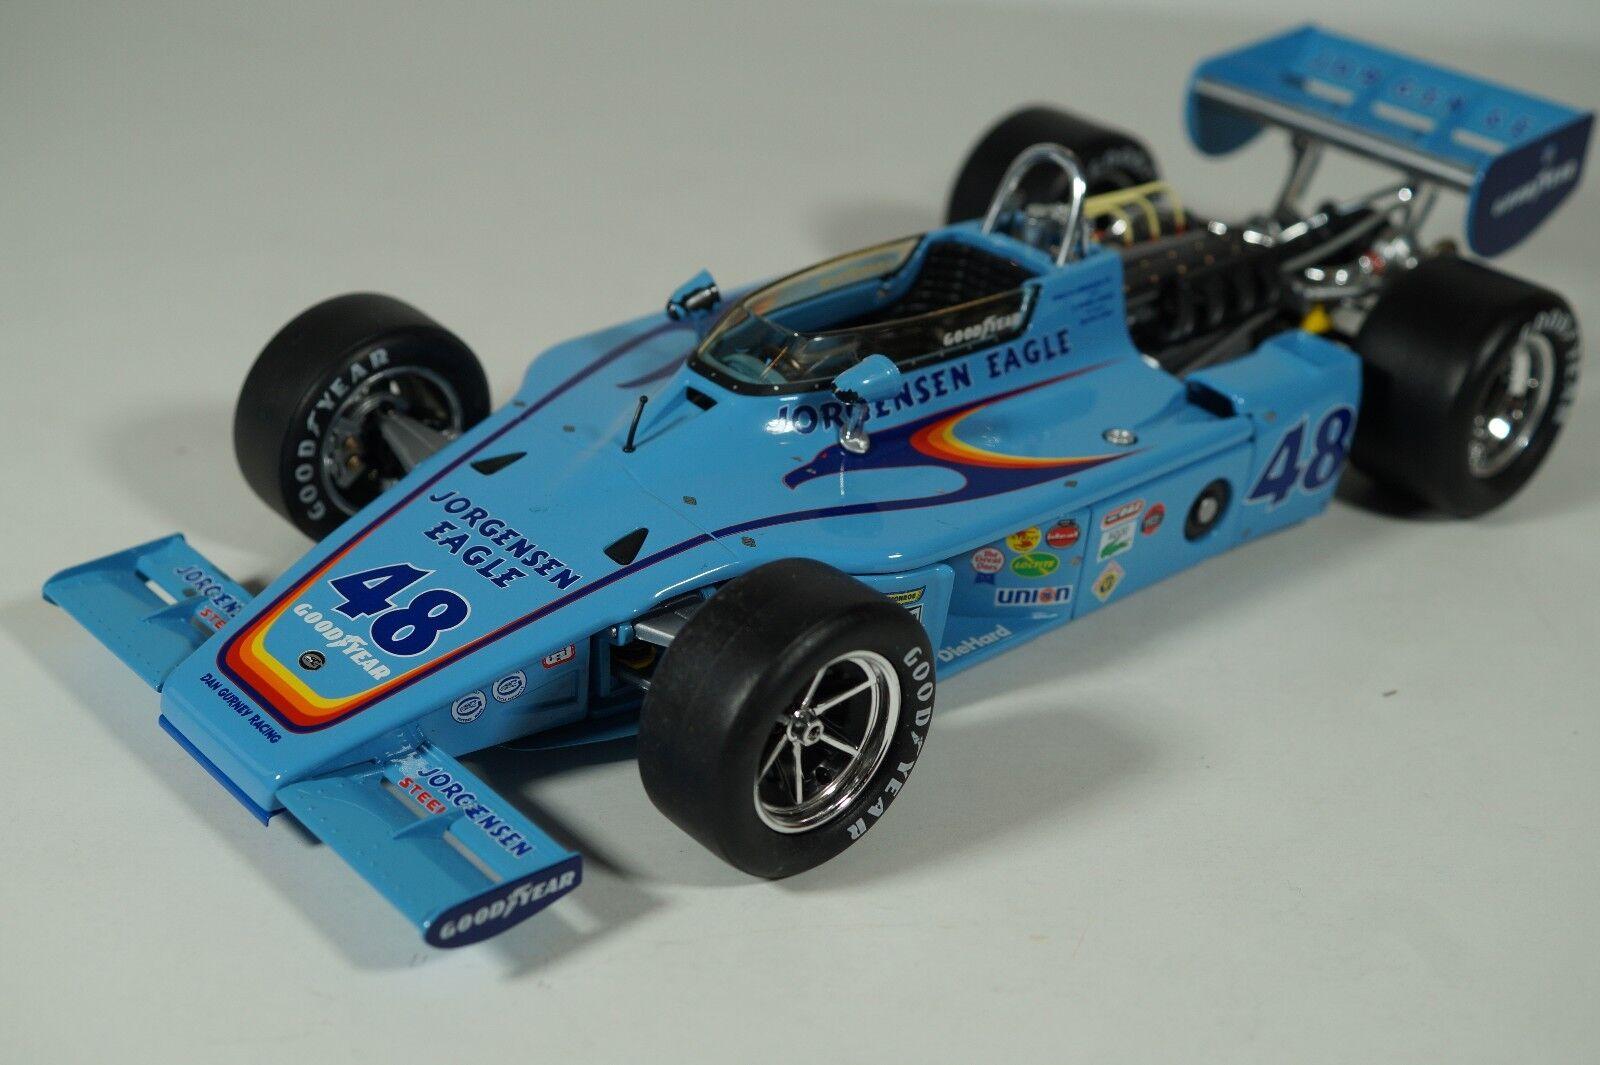 Jorgensen Eagle   48 modèle Nº 4701 - 1975 Indy winner-Bobby Unser - 1974